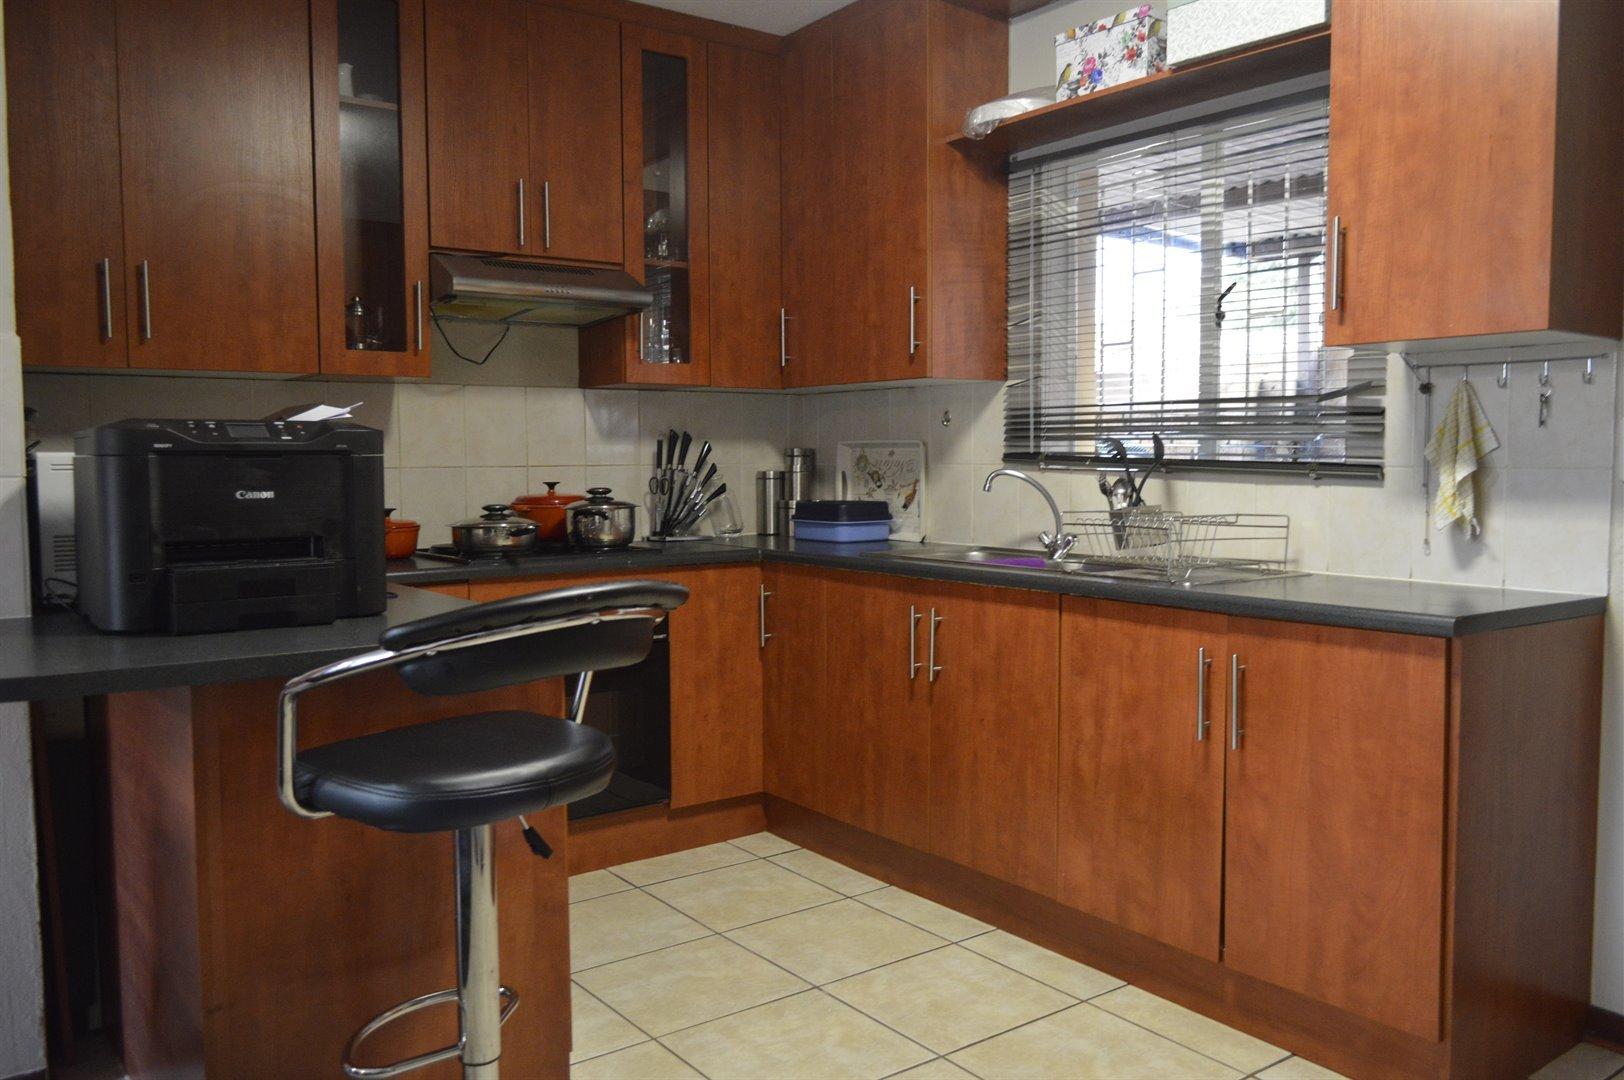 Heuwelsig Estate property for sale. Ref No: 13463647. Picture no 3